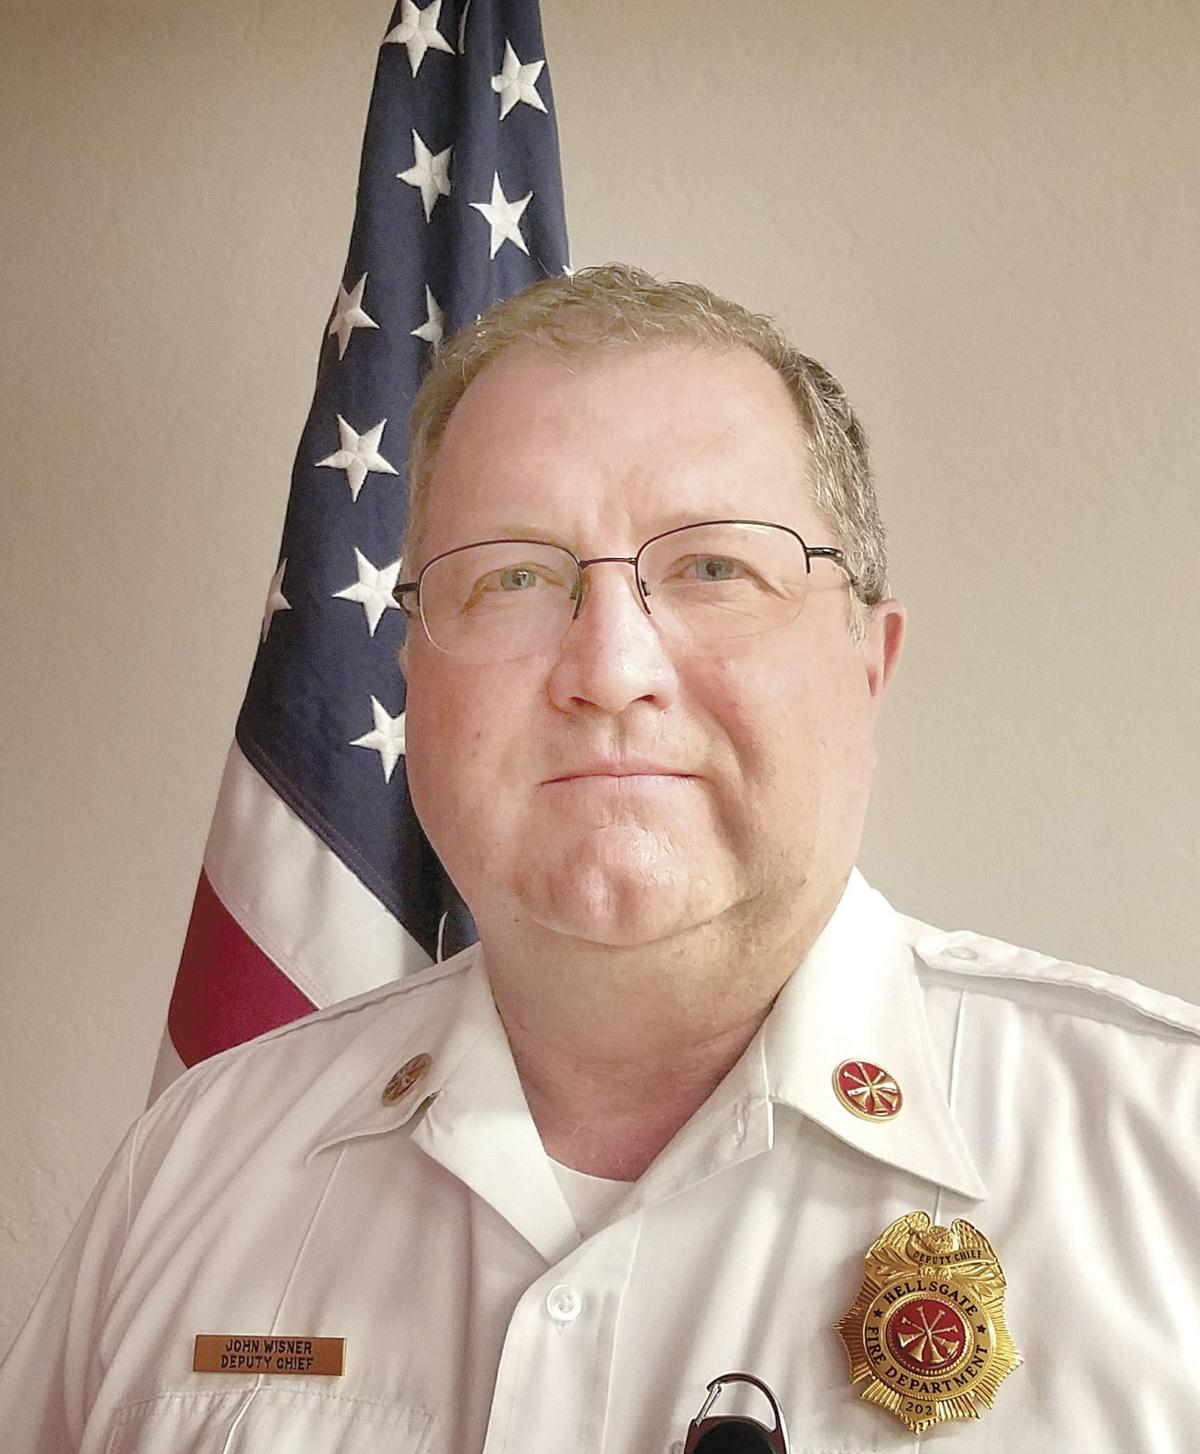 Hellsgate Chief John Wisner